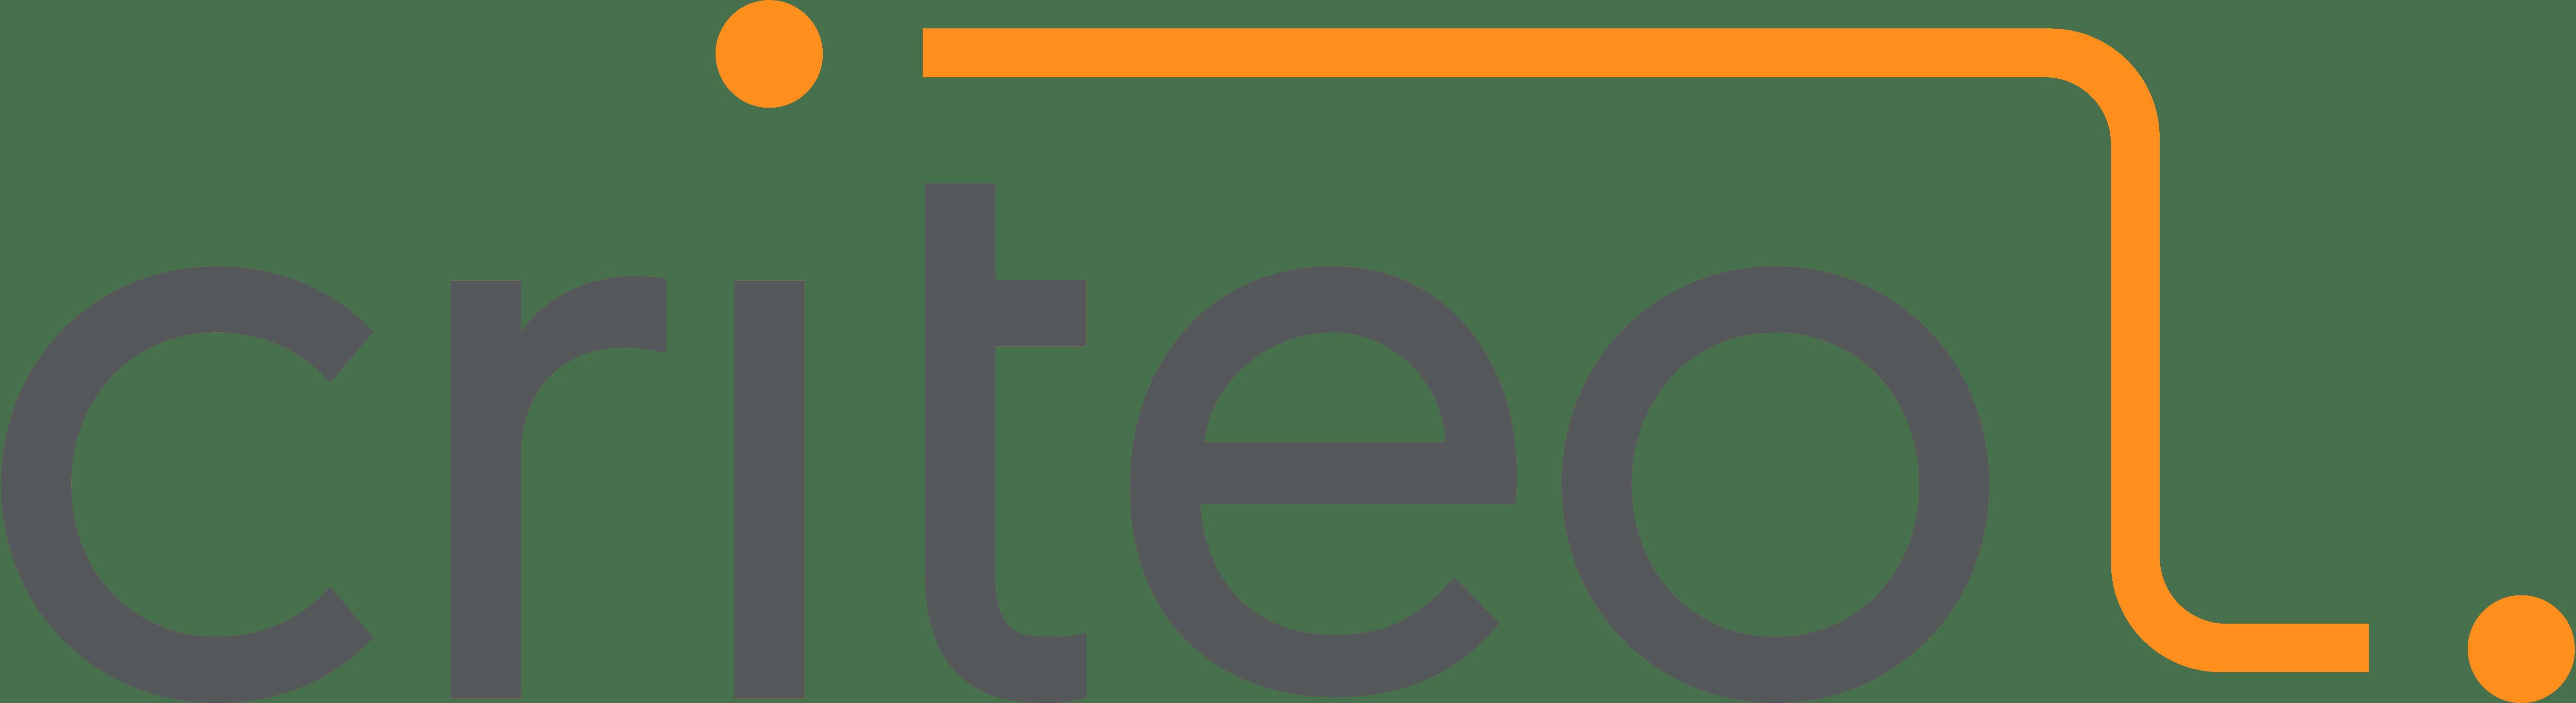 Logo criteo ioikct